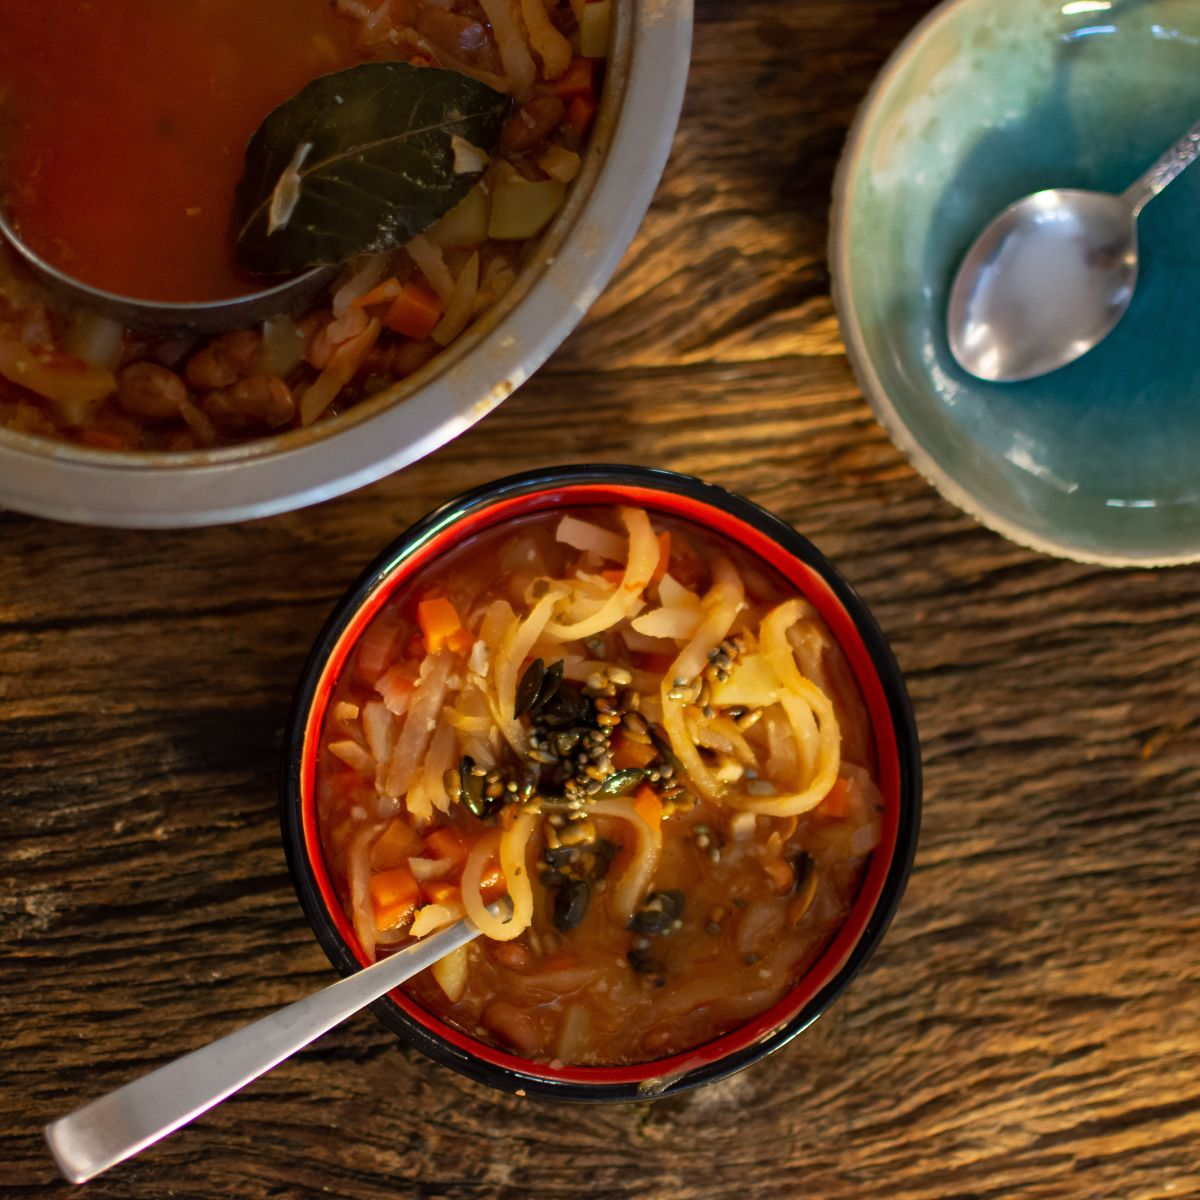 Ricetta Jota Slovena.Slovenian Jota Meatless With Sour Turnip Recipe